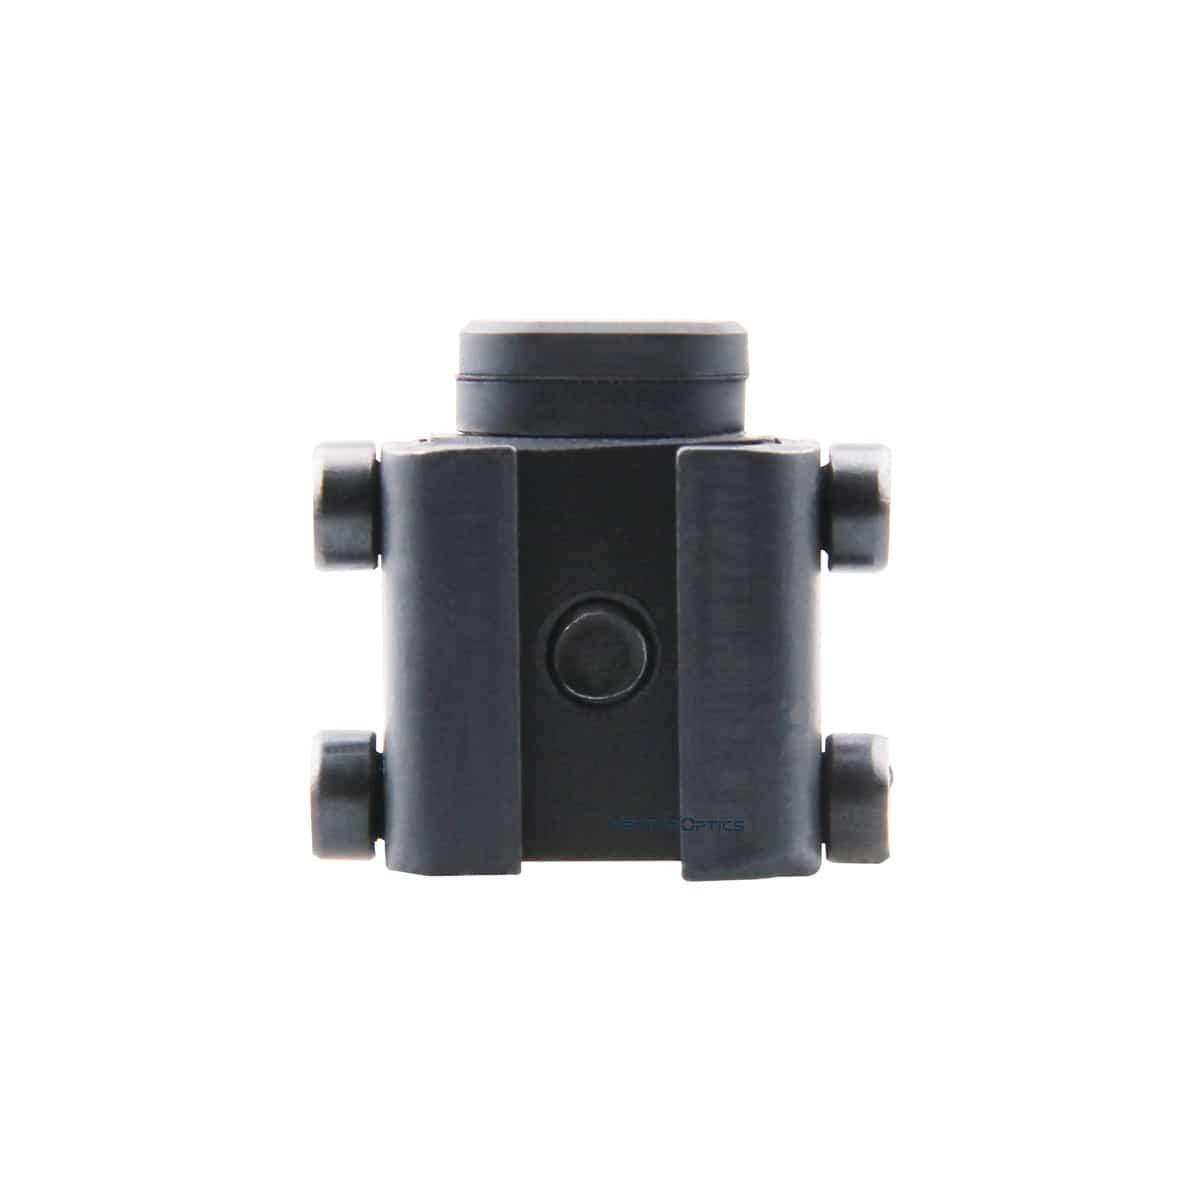 Riflescope Recoil Stopper